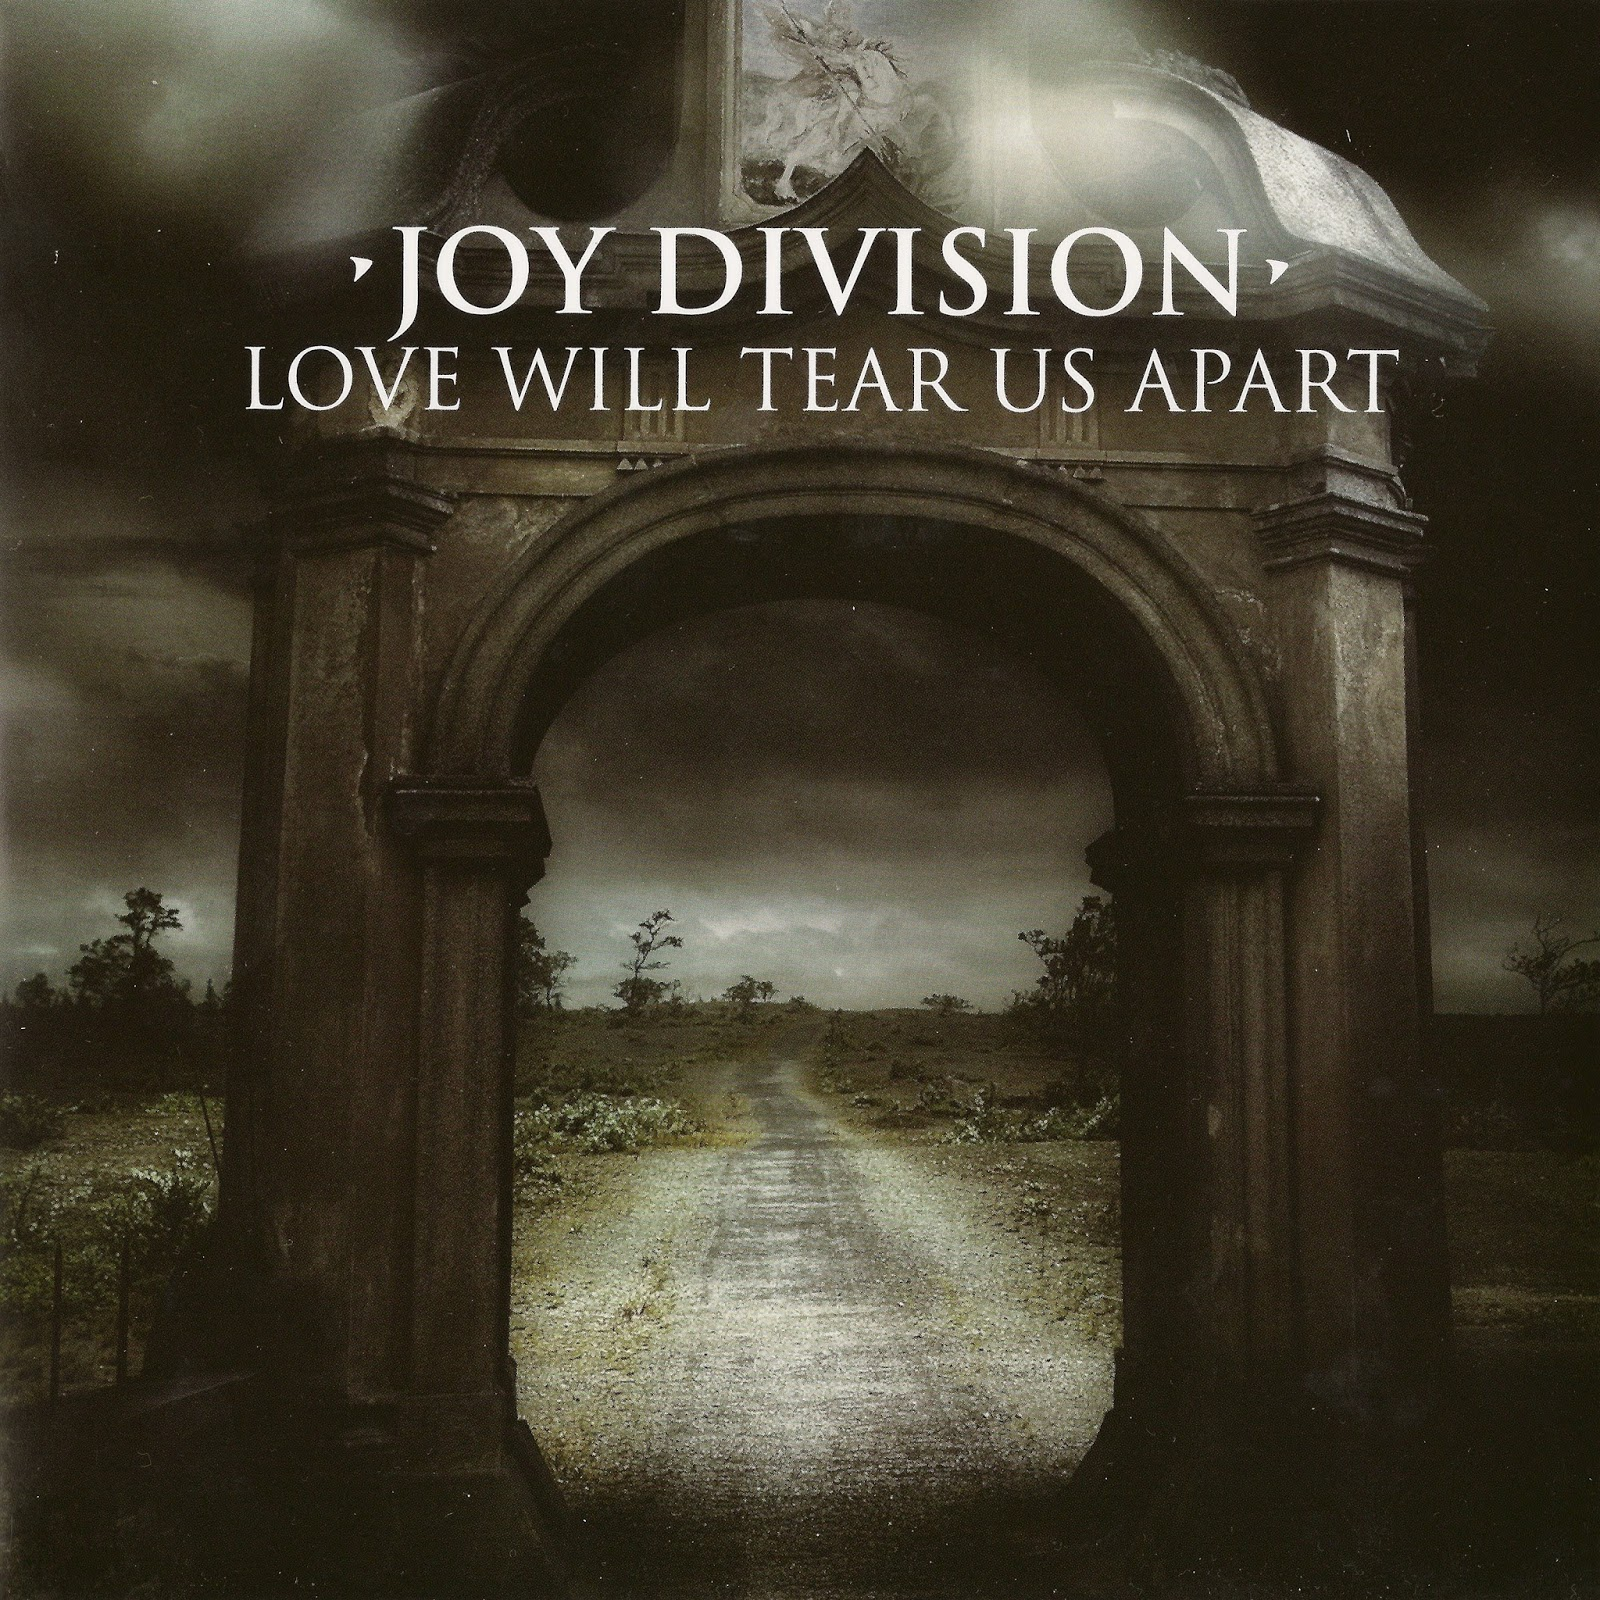 Tearing Apart: Música Libertad Del Alma: [DD] Discografía Joy Division